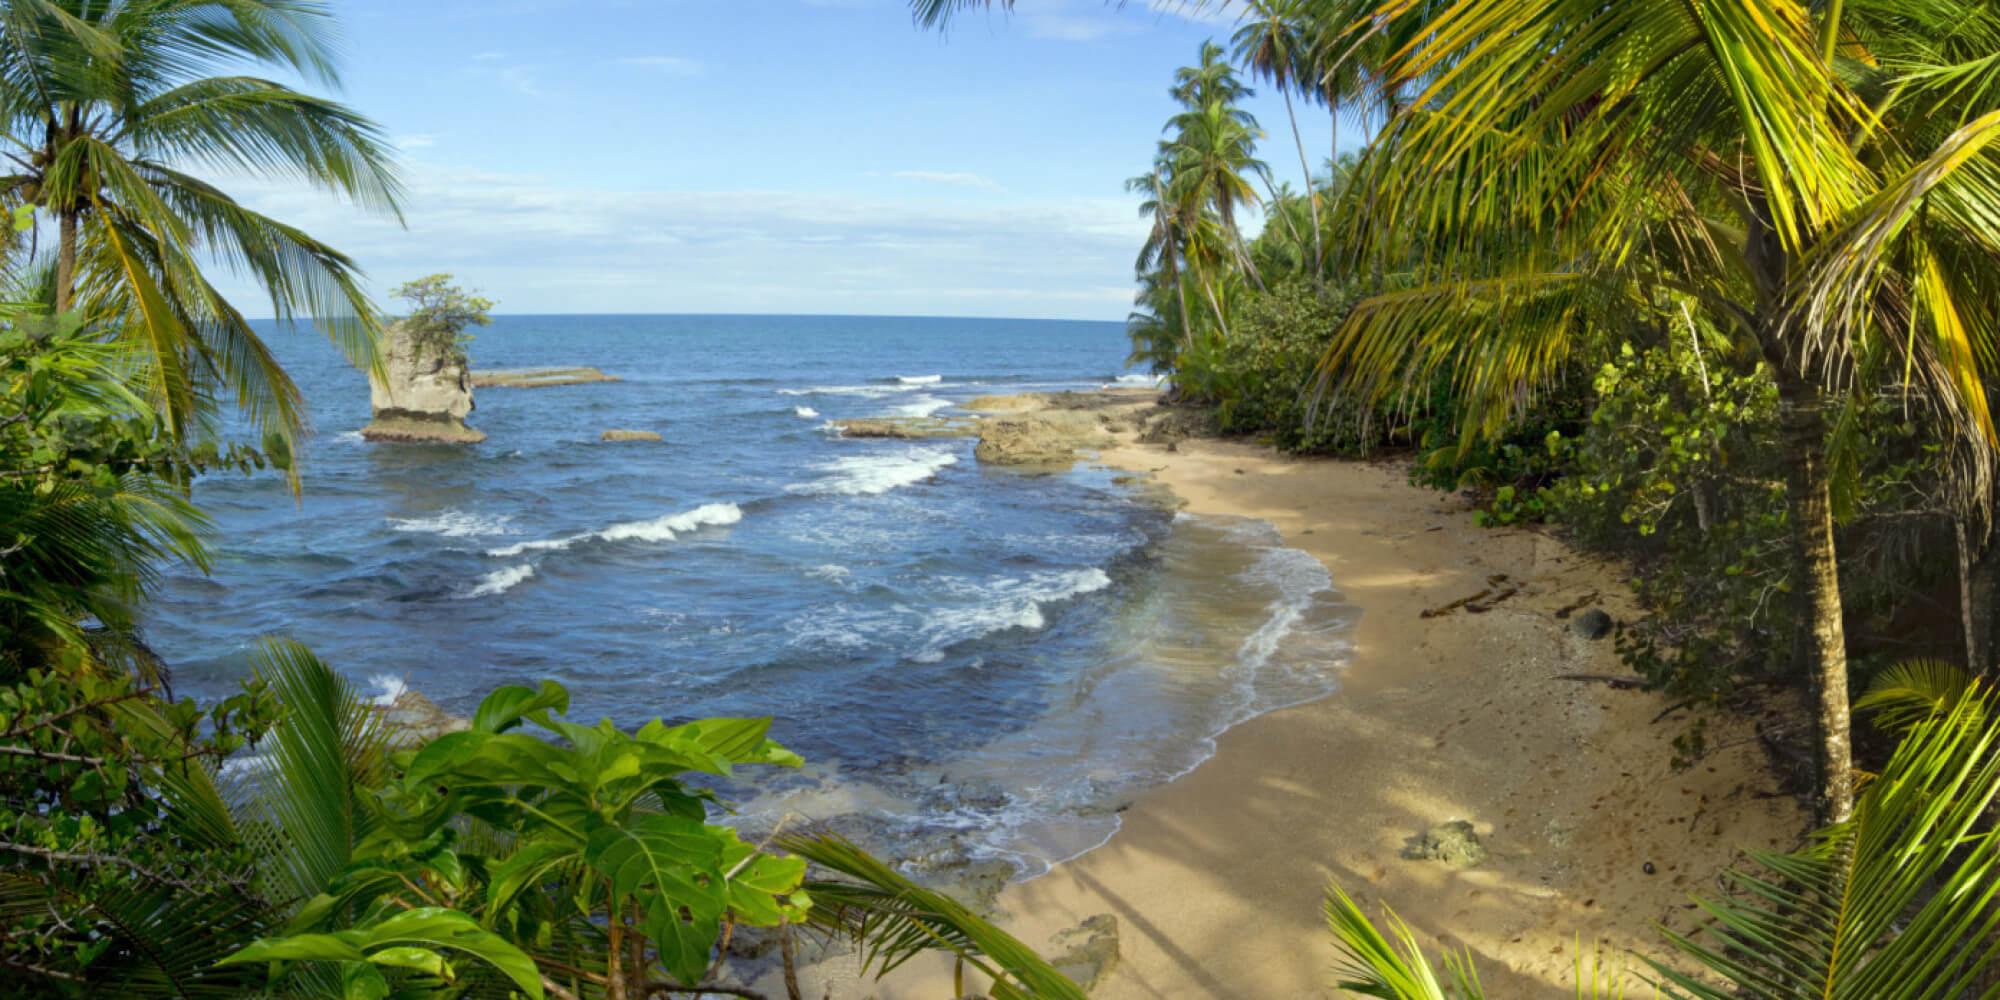 Costa Rica, Manzanillo Wildlife Refuge